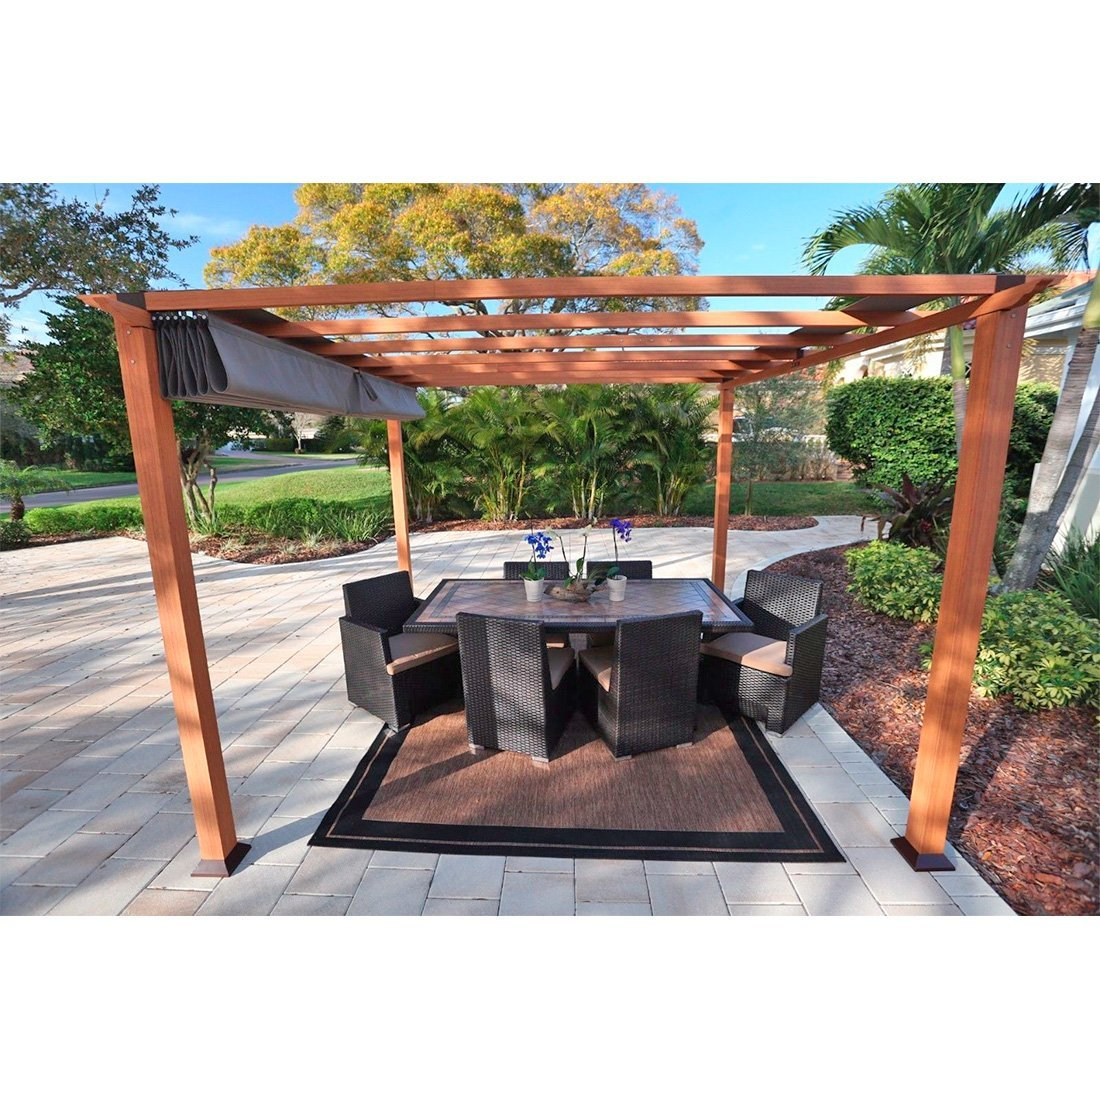 Amazon STC 10 H X 11 W D Pergola Garden Outdoor